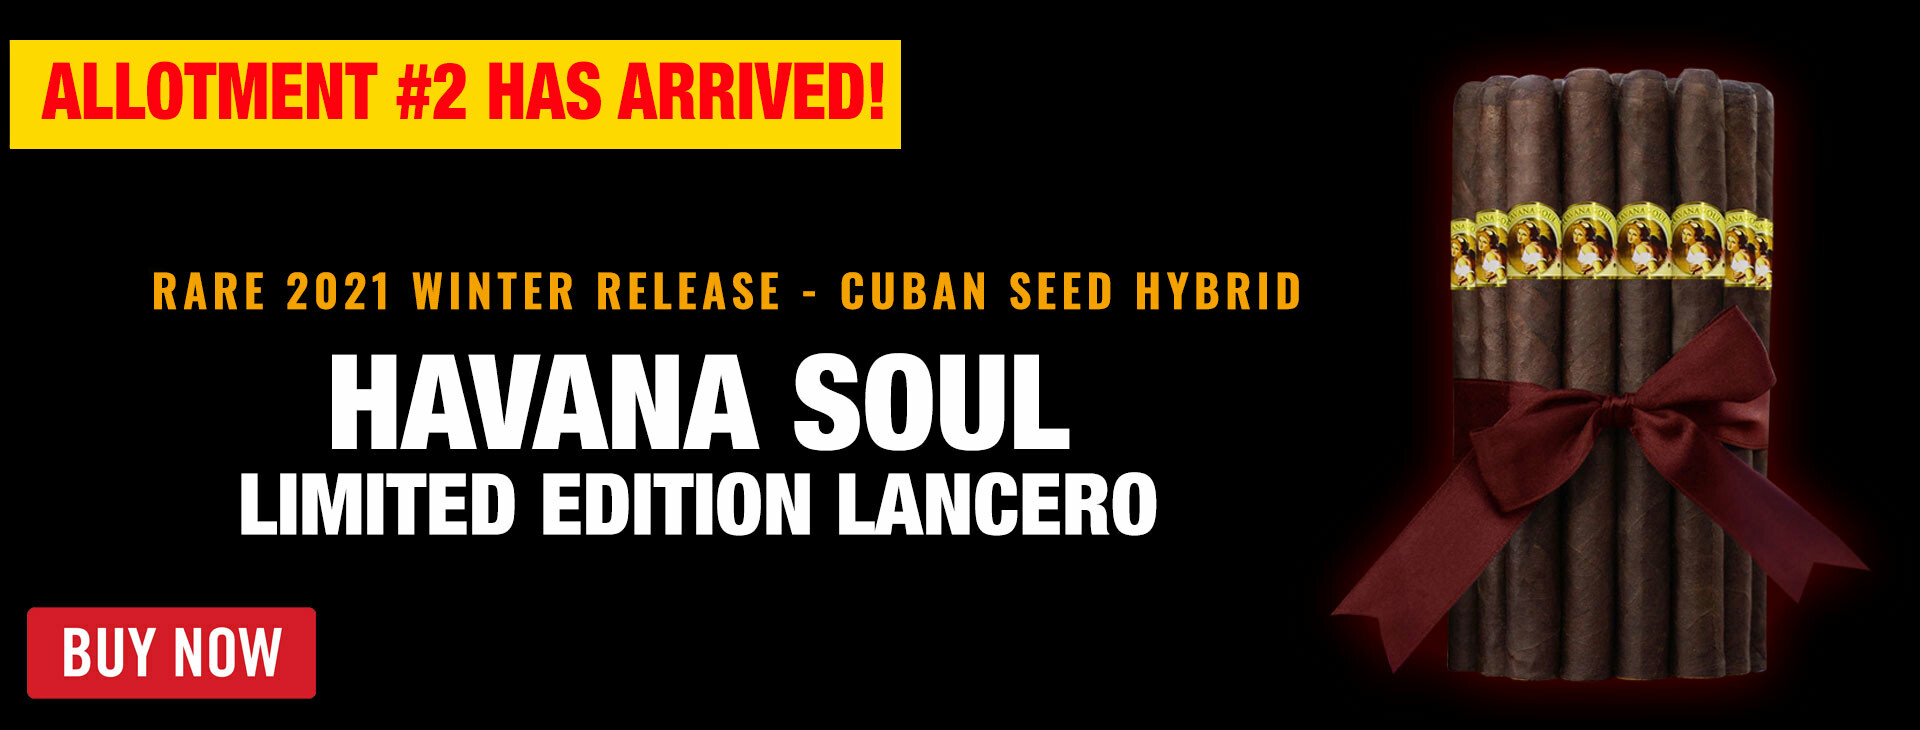 Havana Soul IV 2021 Limited Edition Lancero